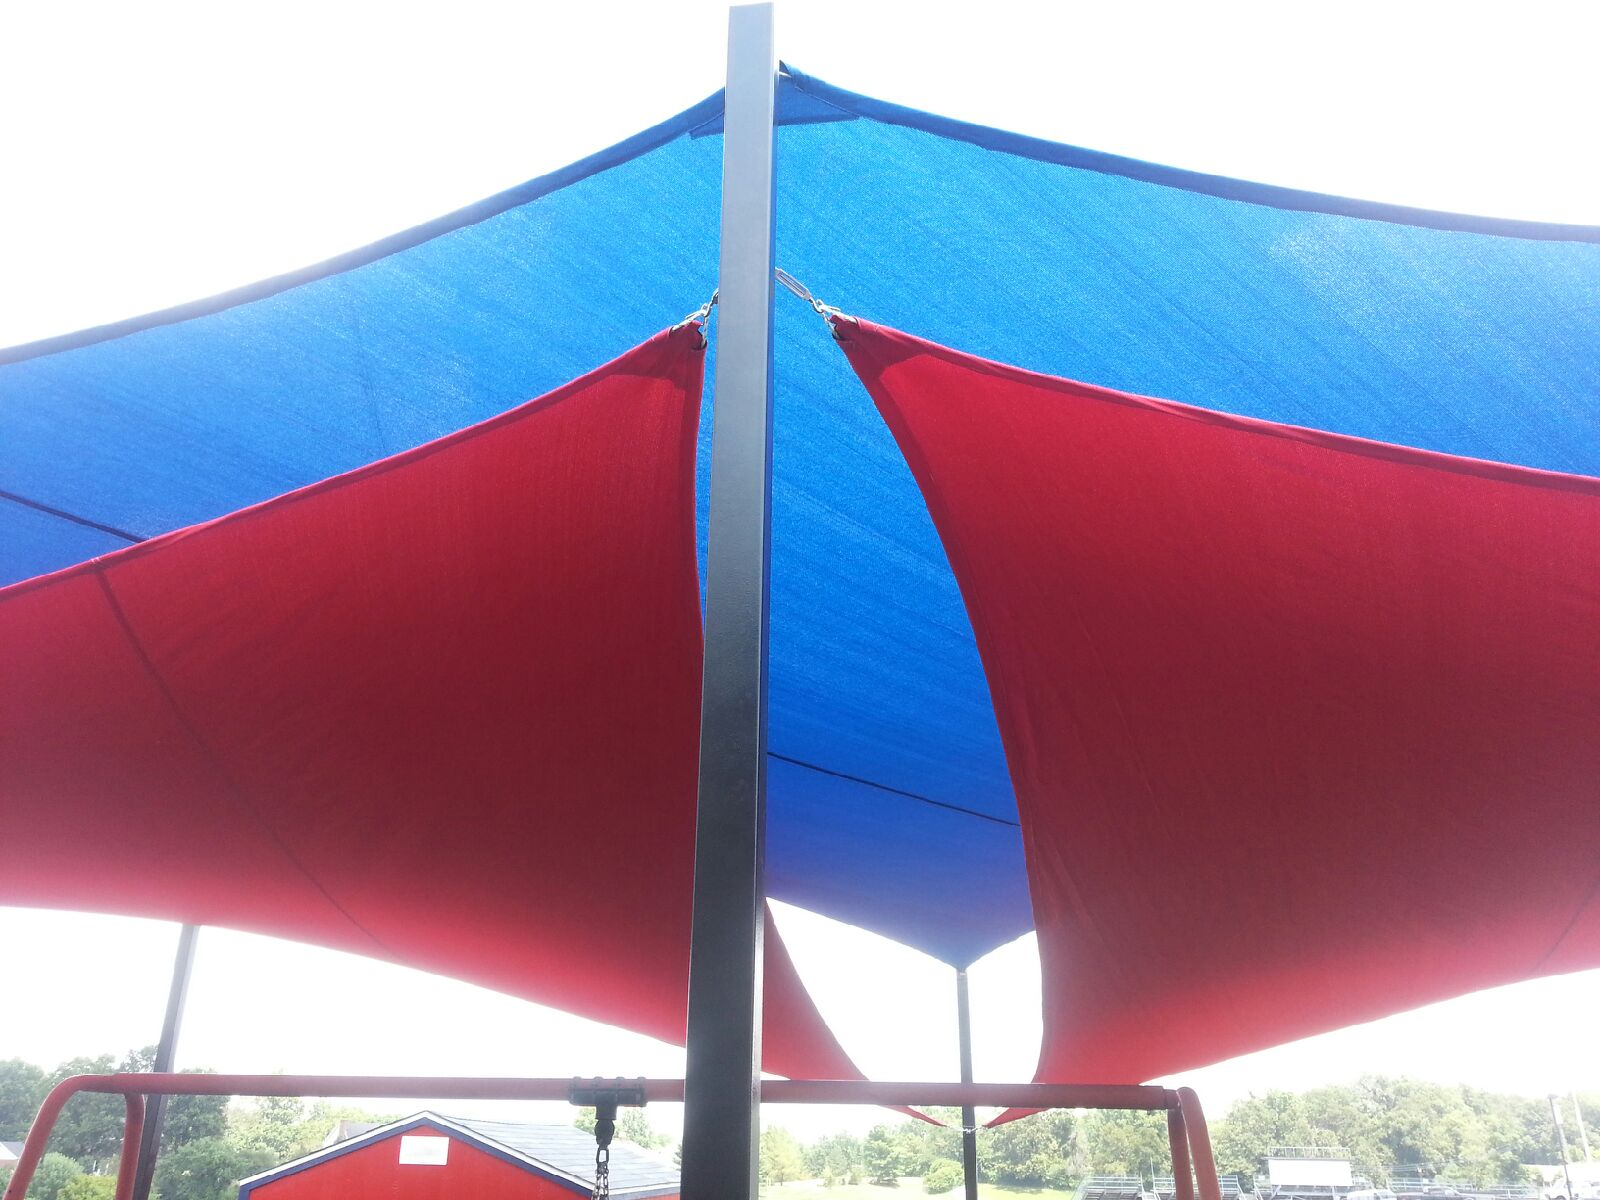 Clarkson Valley ECE shade sails